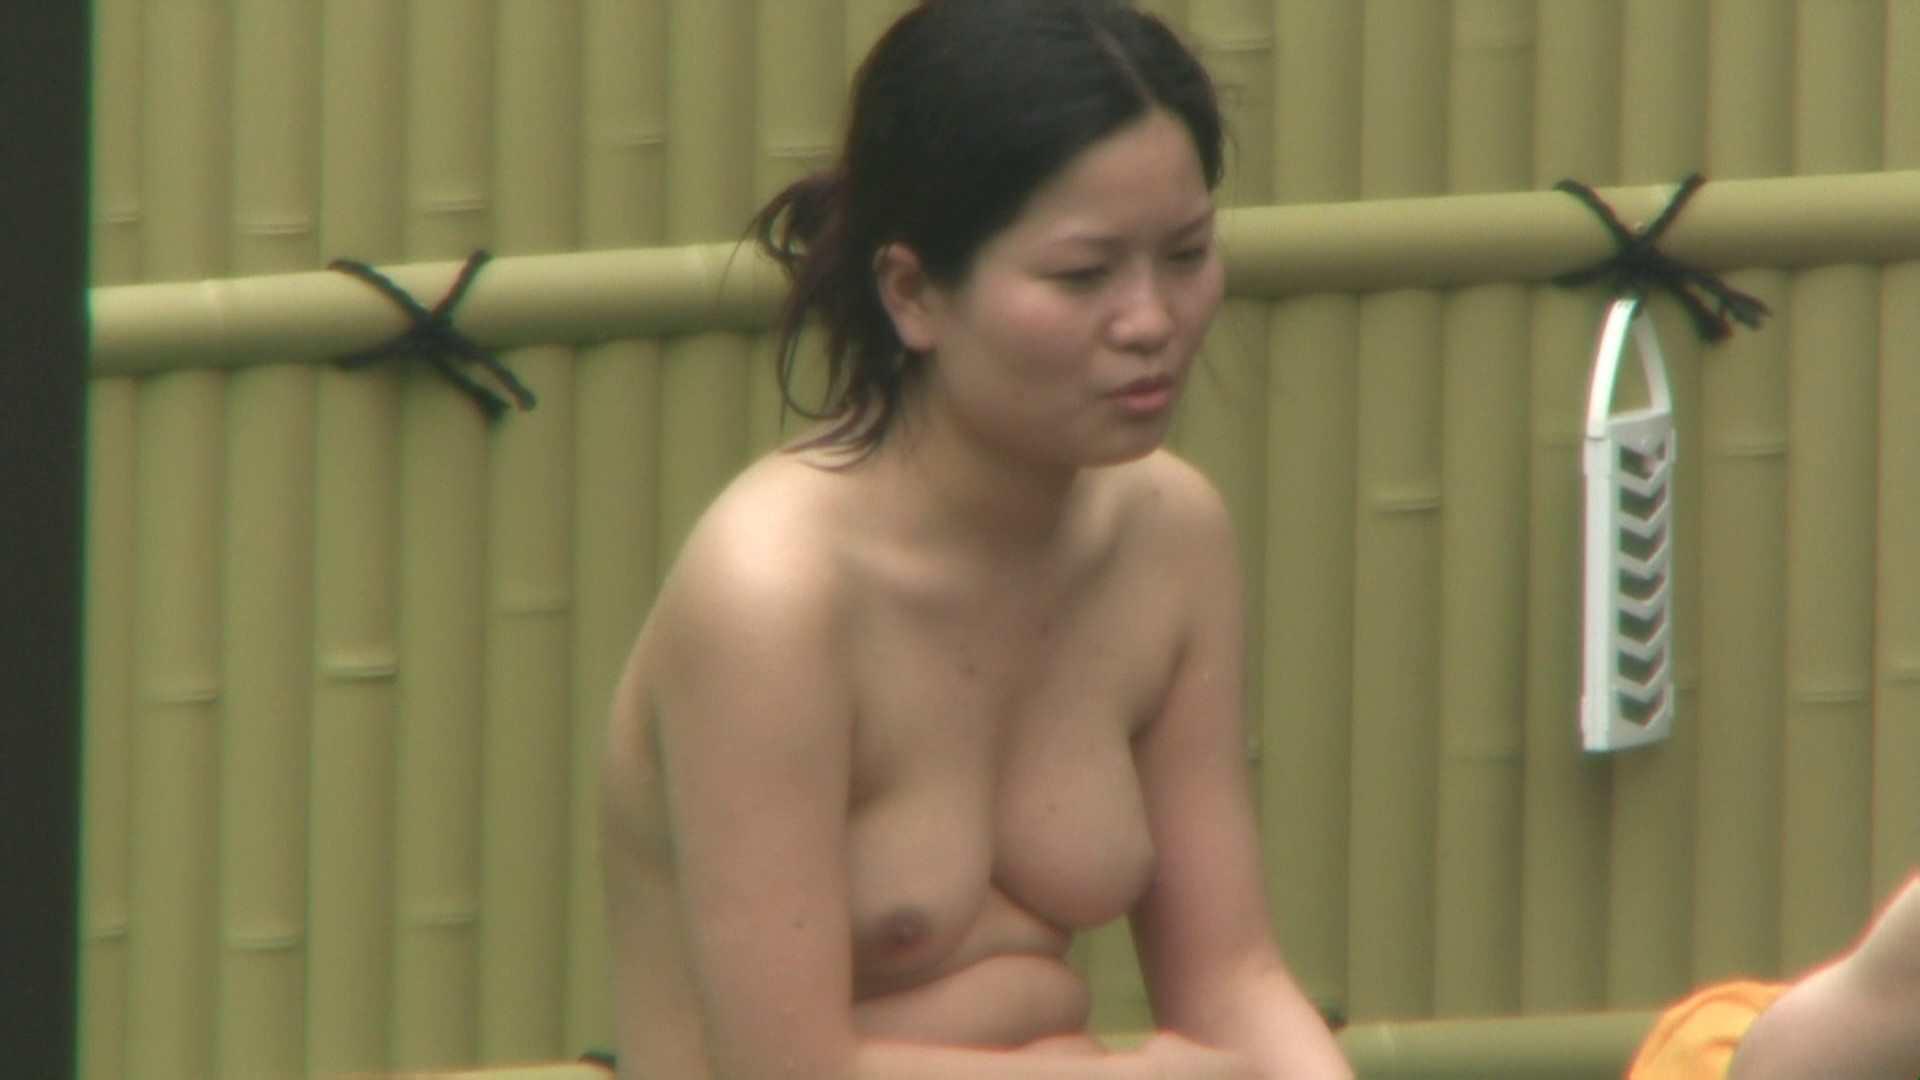 Aquaな露天風呂Vol.73【VIP限定】 盗撮 | HなOL  54pic 37